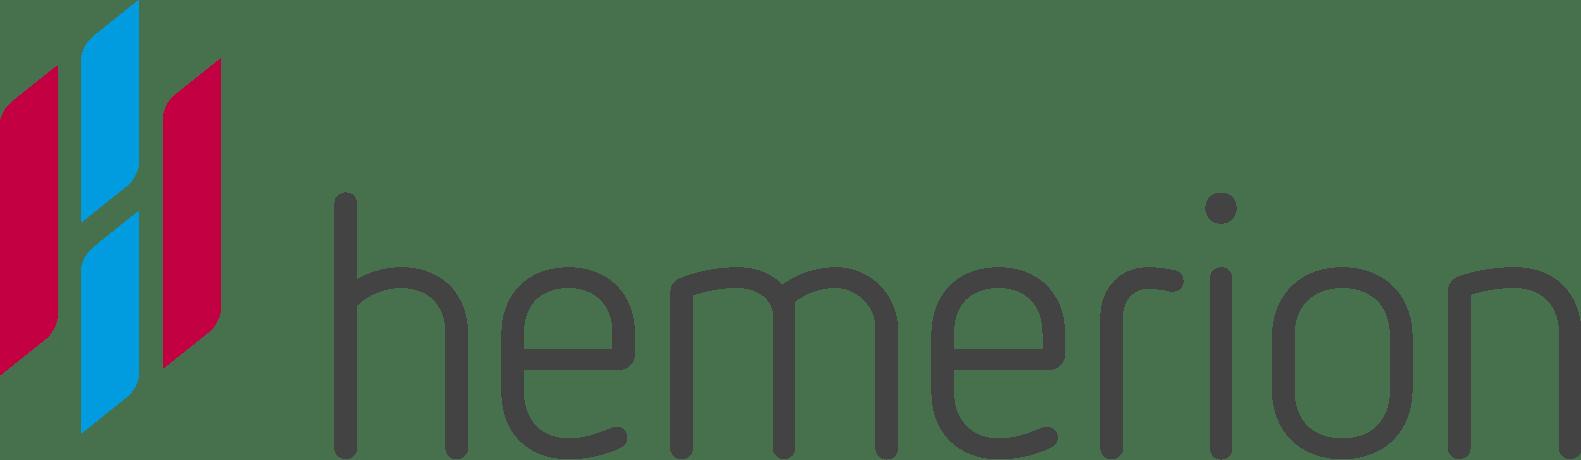 Hemerion